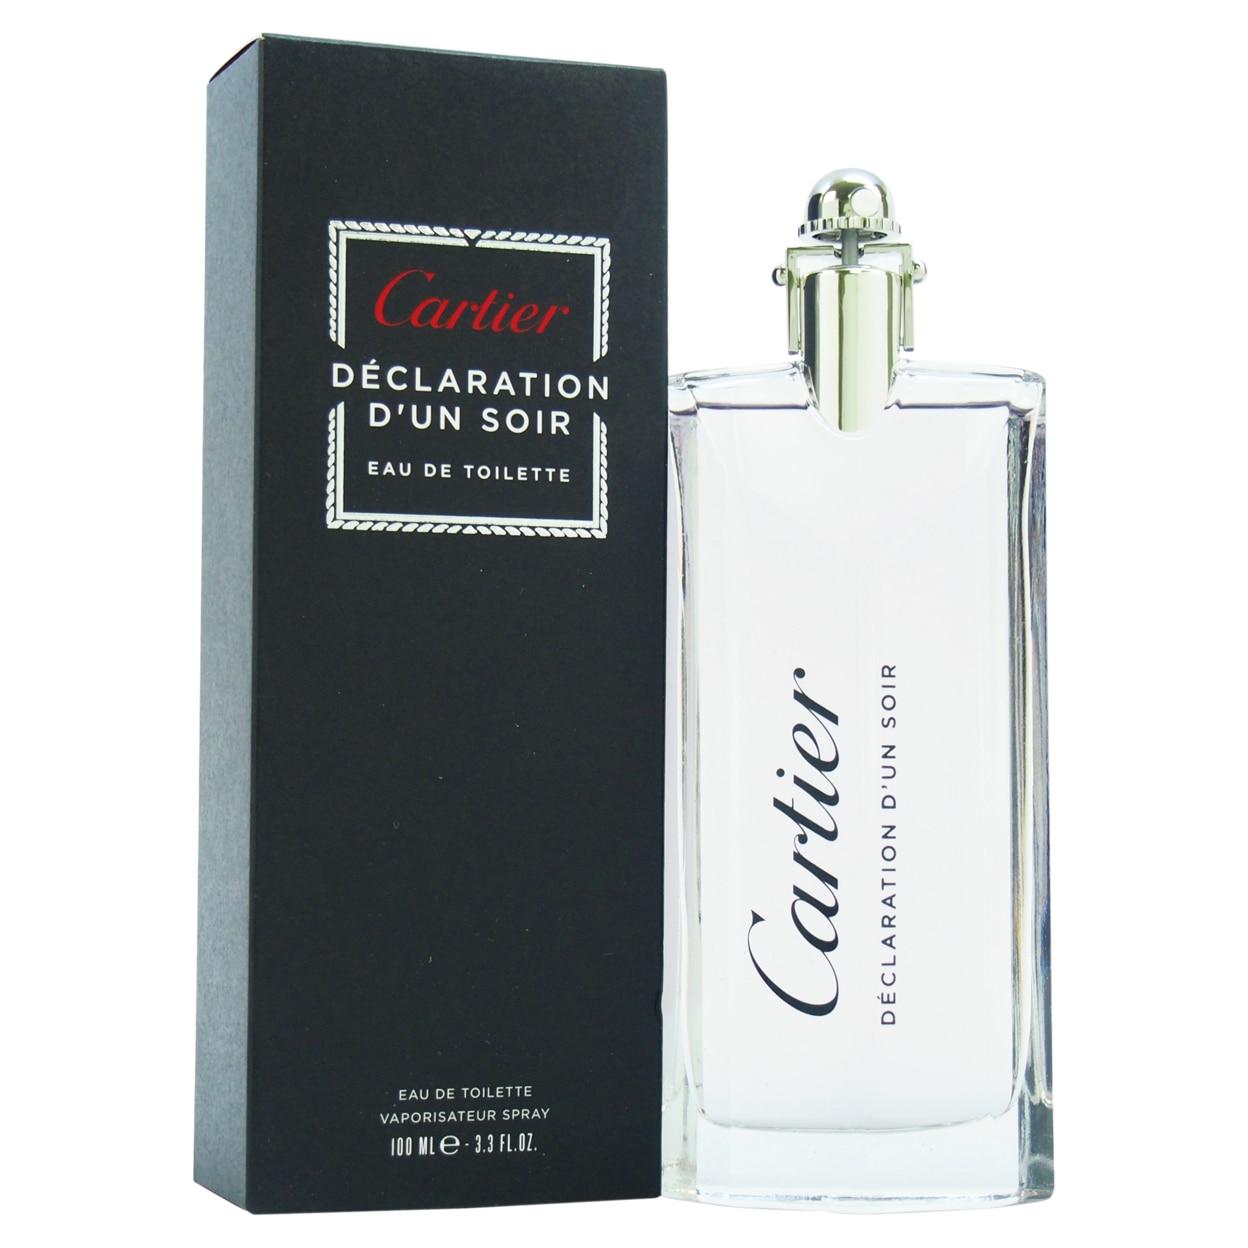 Declaration Dun Soir by Cartier for Men - 3.3 oz EDT Spray